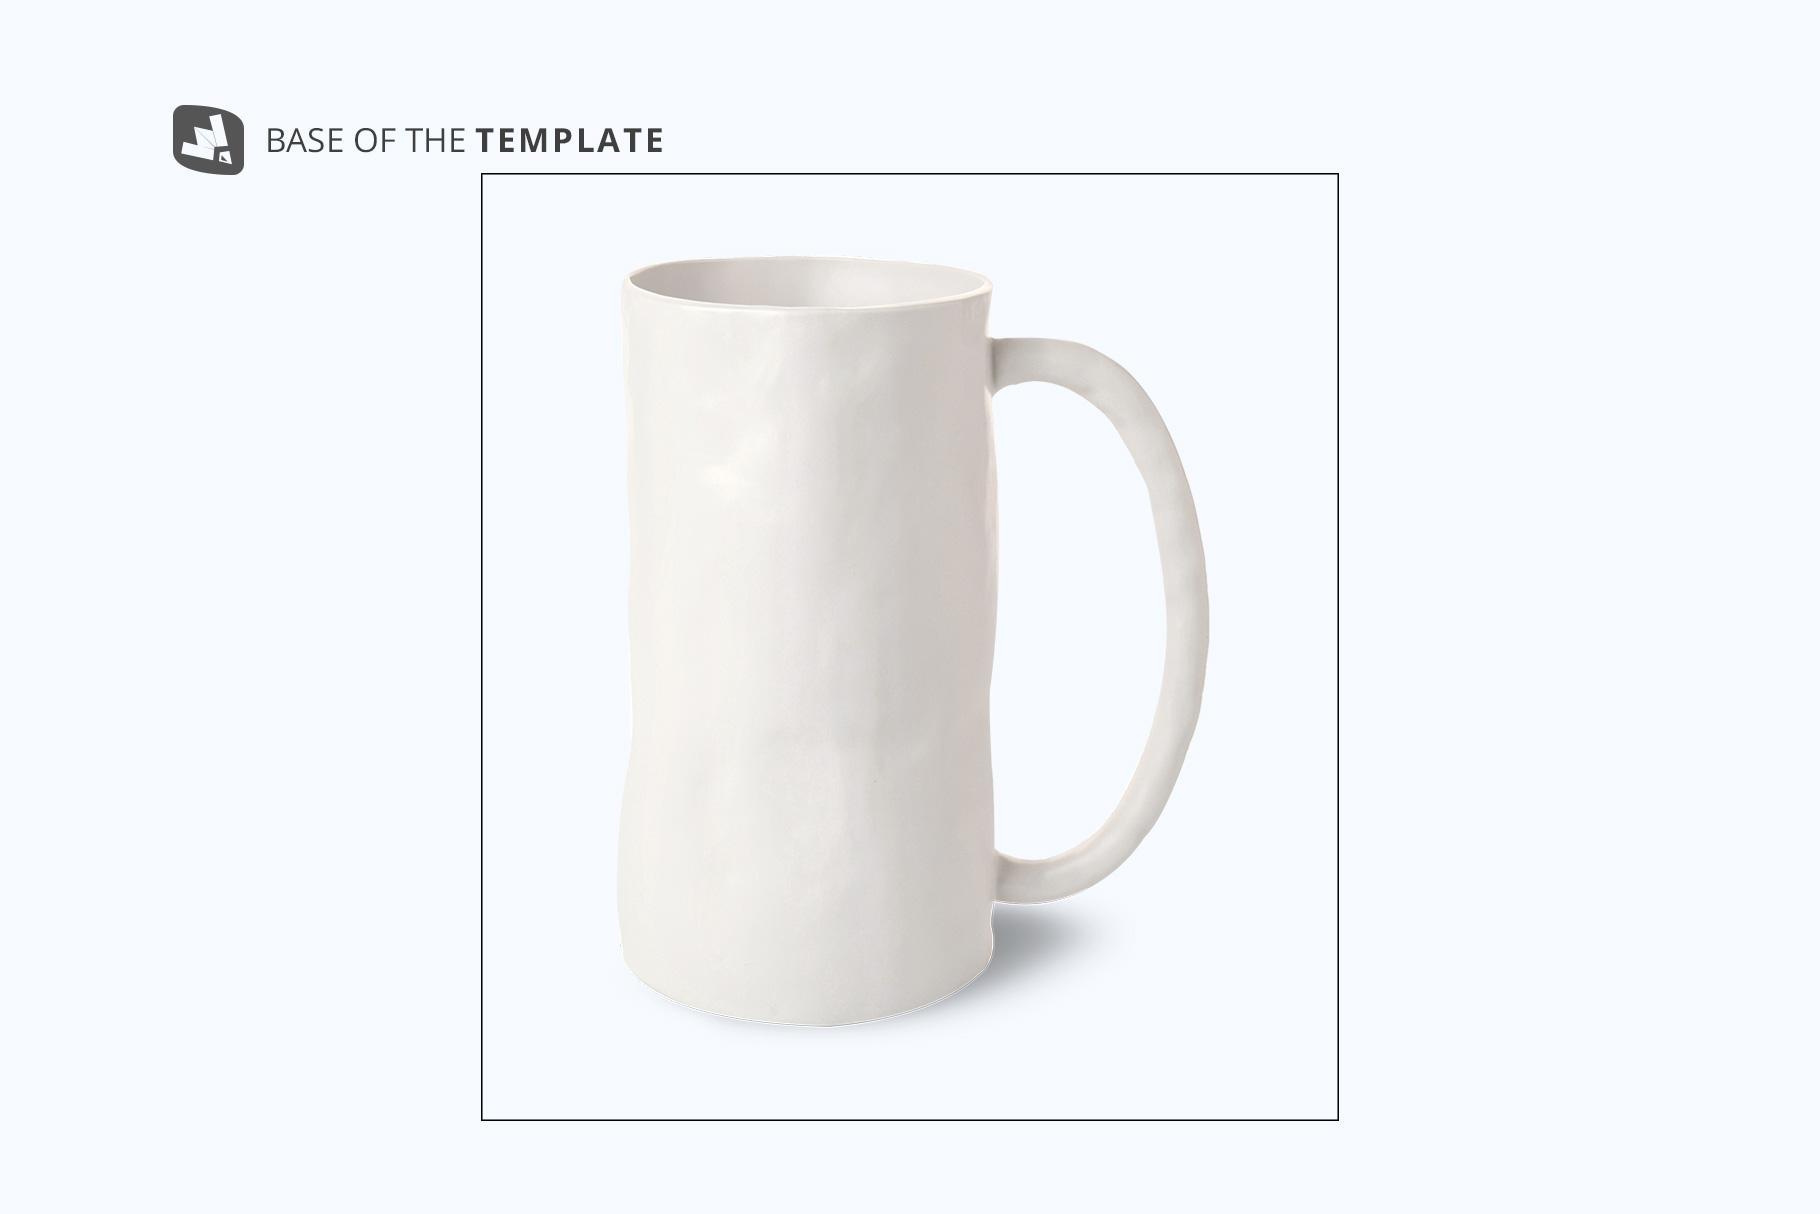 base image of the ceramic jug set mockup